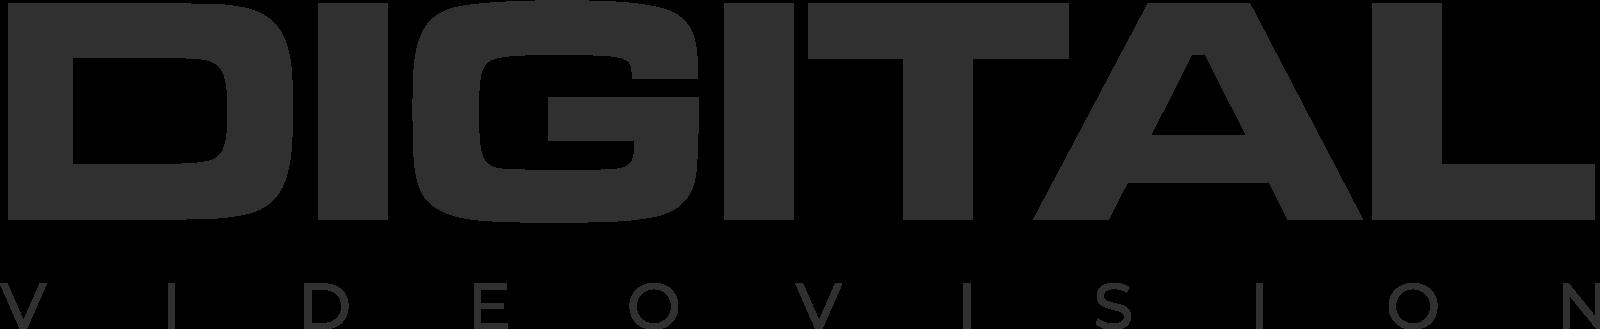 Digital VideoVision Logo